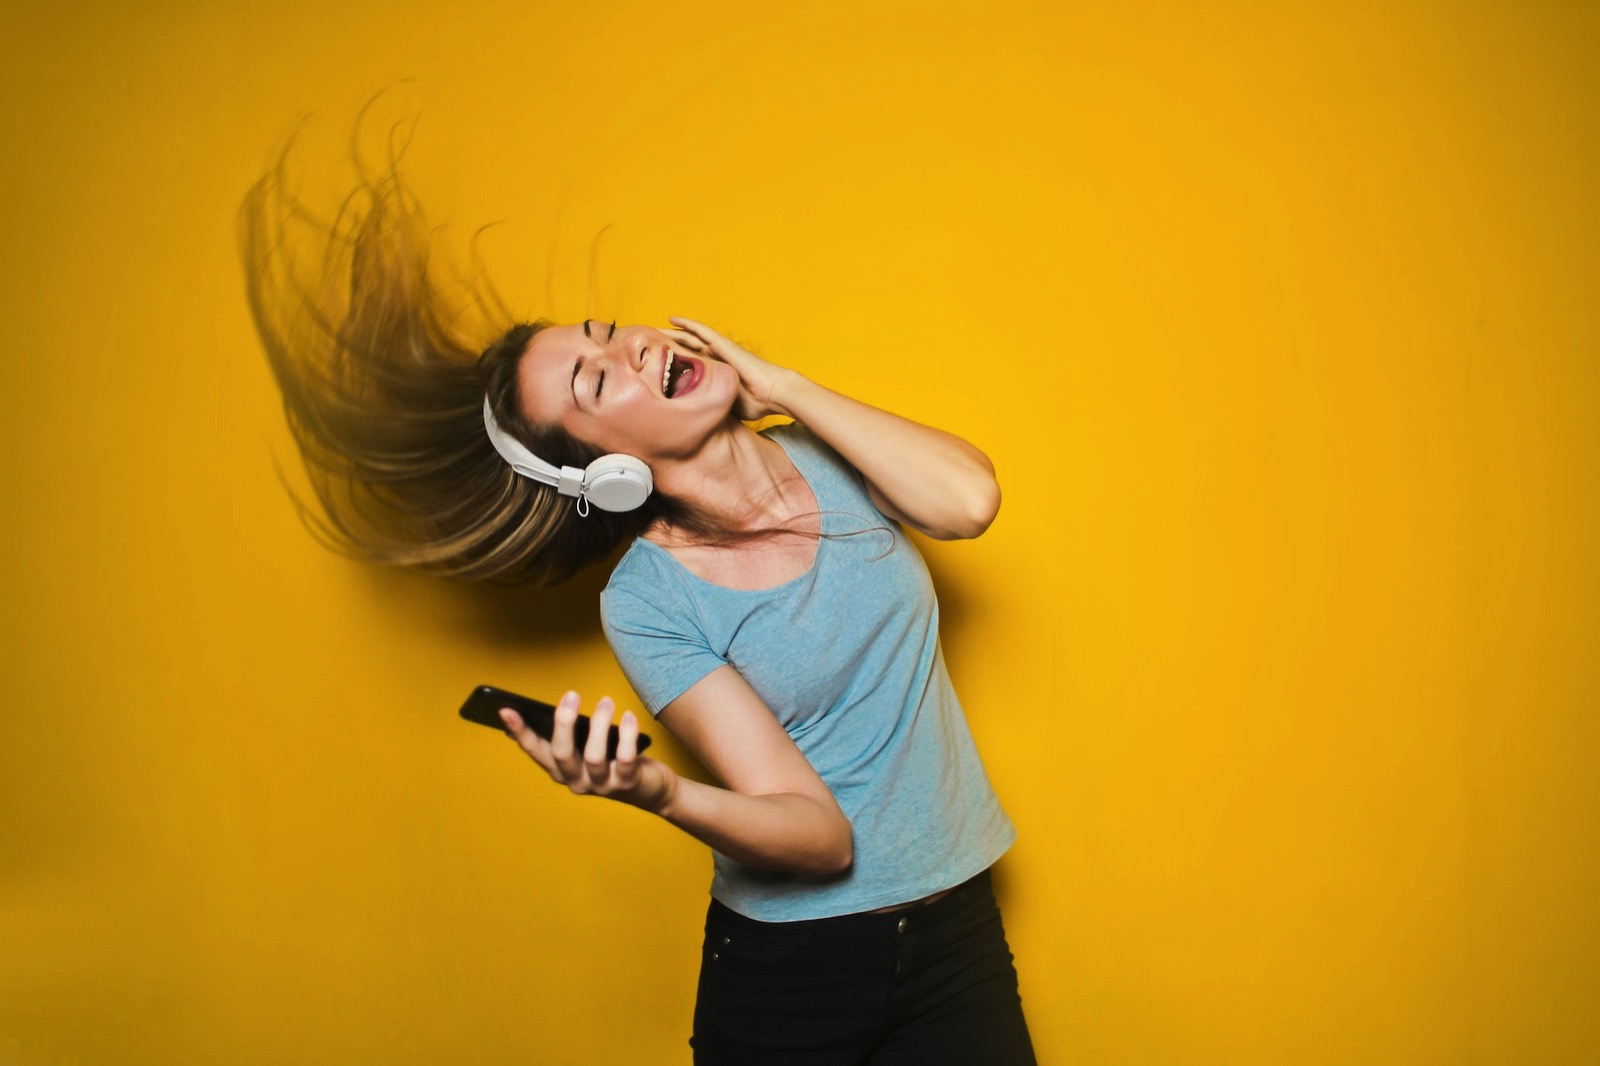 bruce-mars-558710-unsplash-woman-with-headphones.jpg